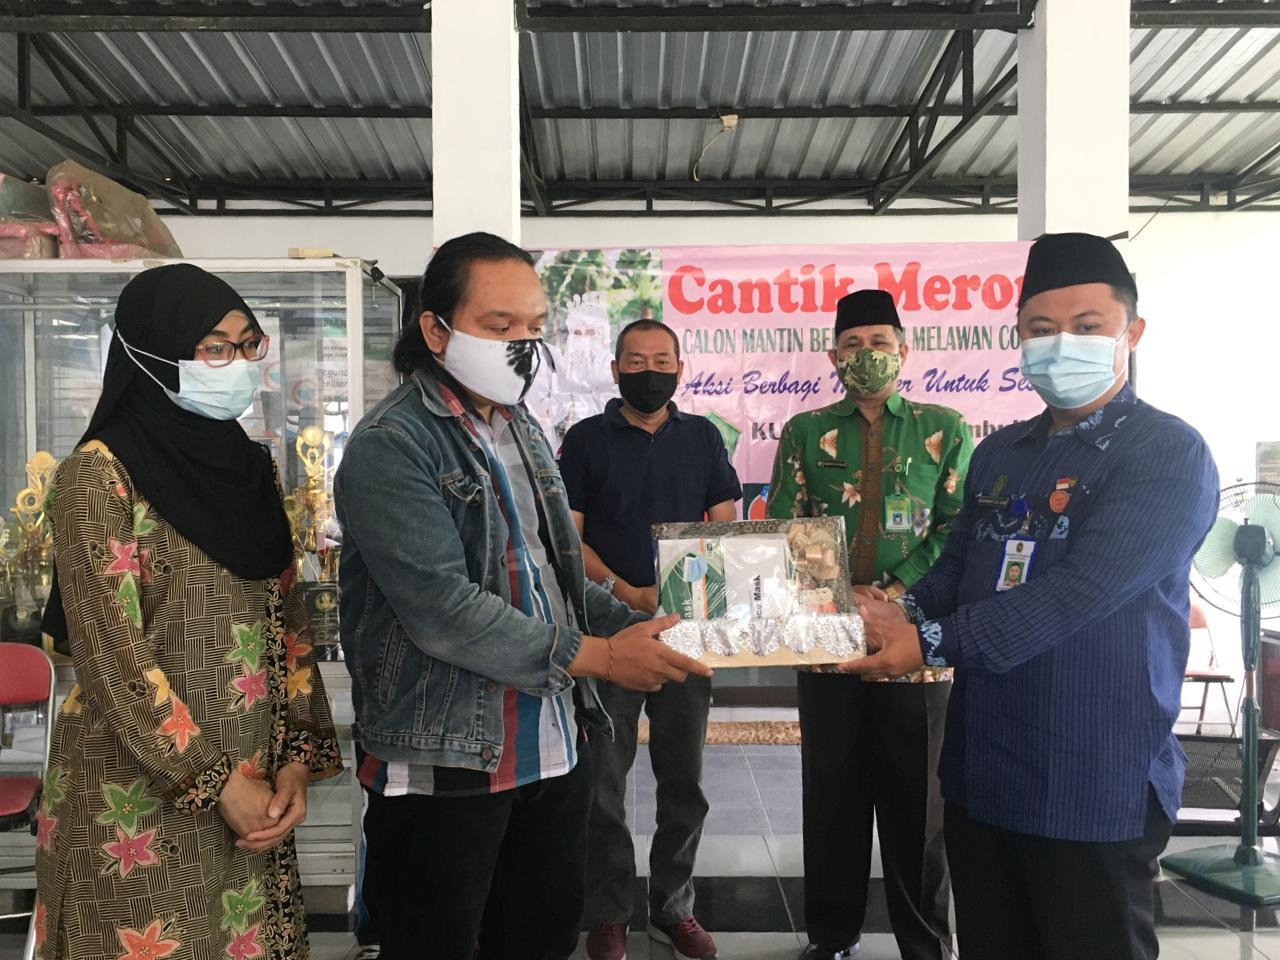 KUA Kemantren Umbulharjo Launching Cantik Merona